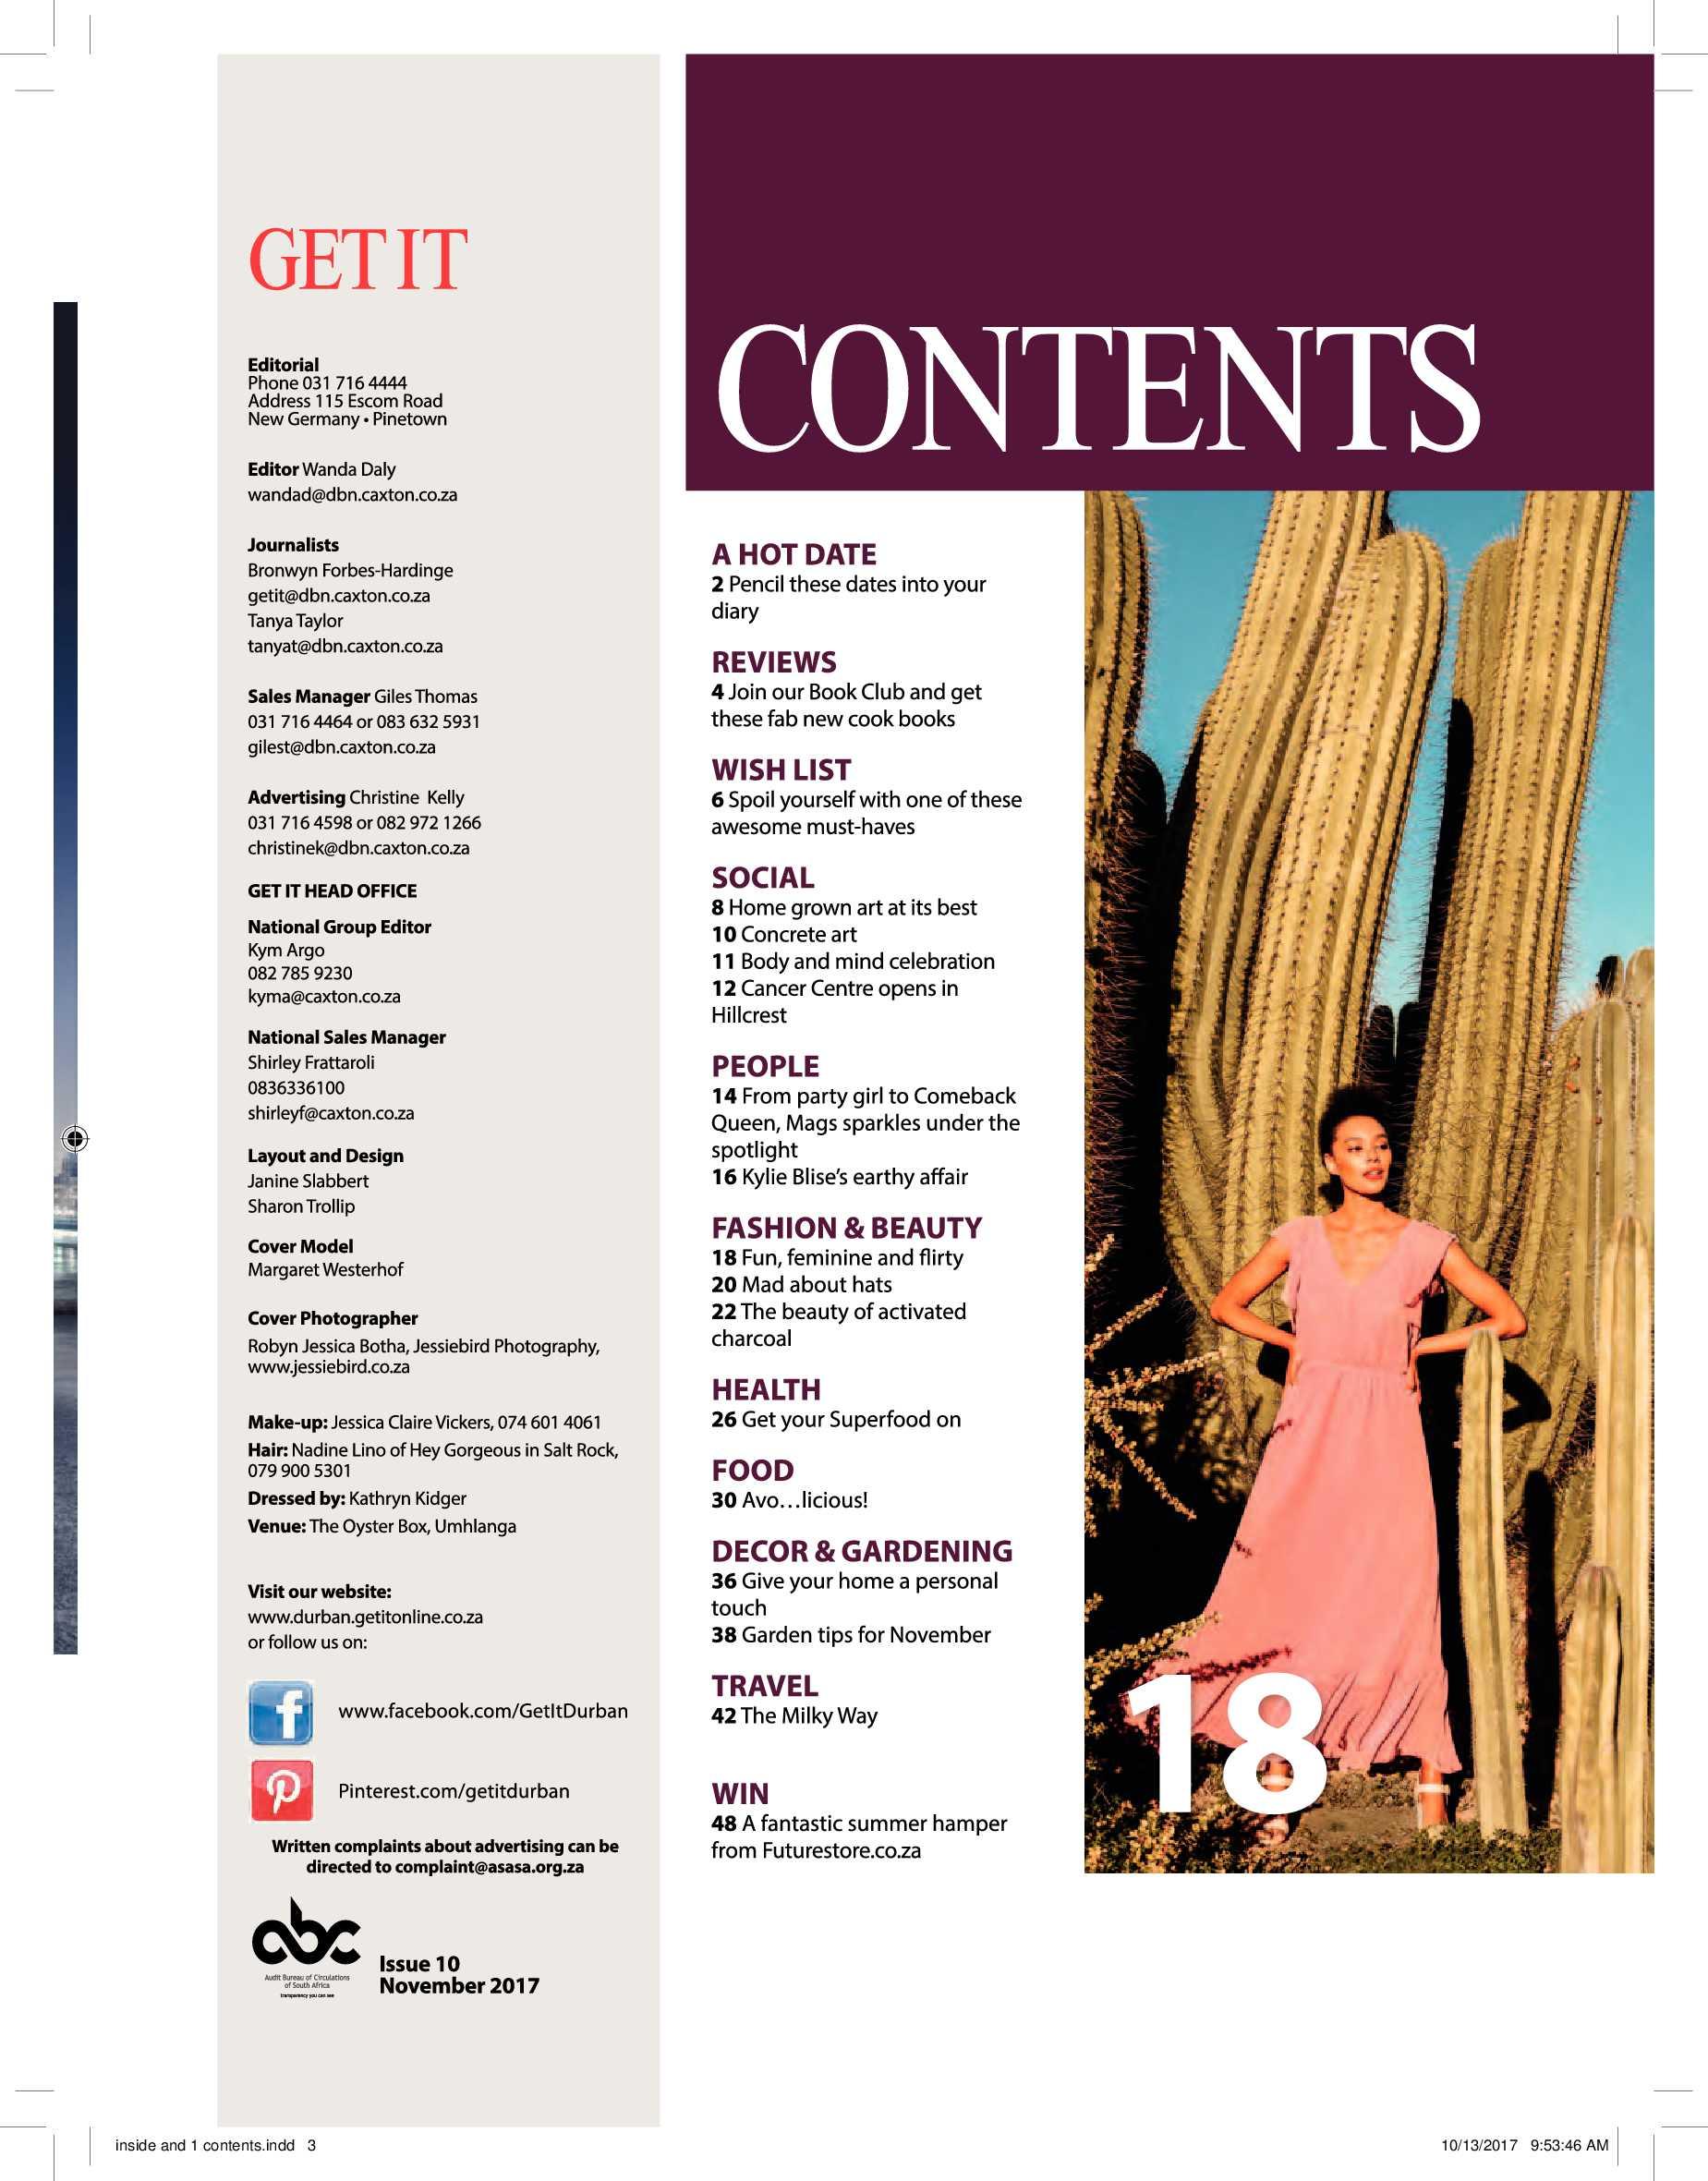 get-magazine-durban-november-2017-epapers-page-3